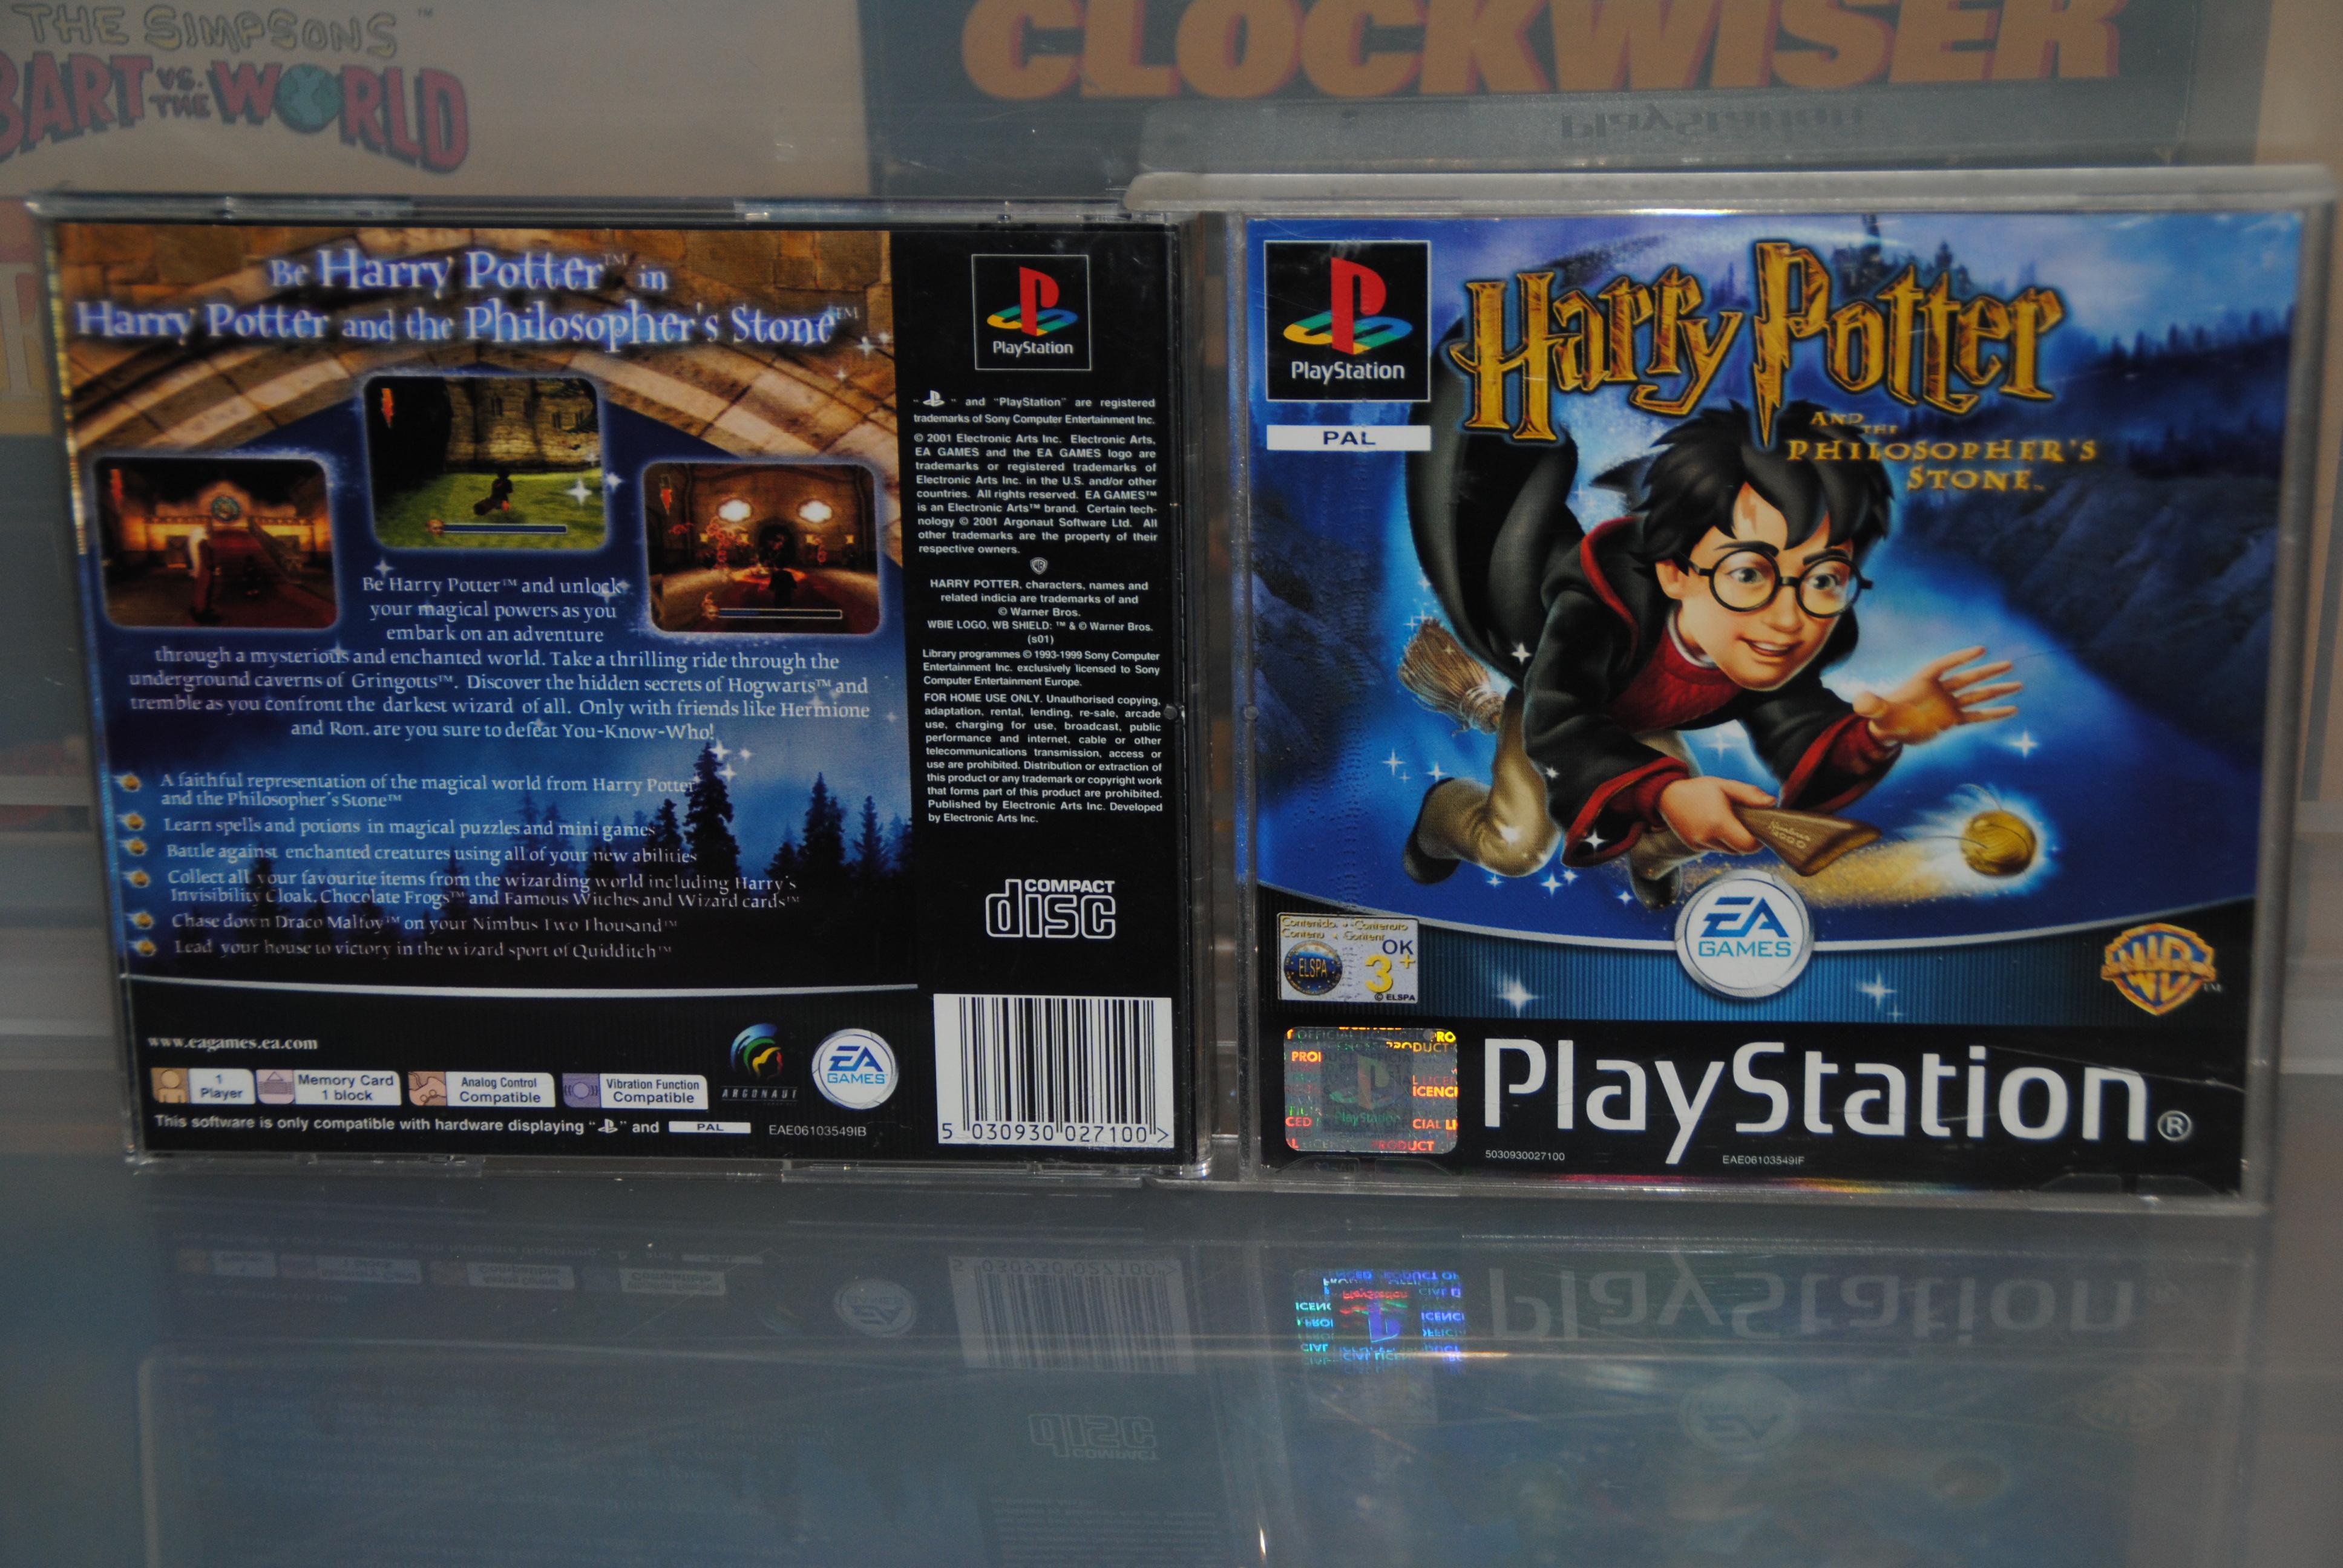 E.A - Harry Potter - Philosopheres Stone Cover